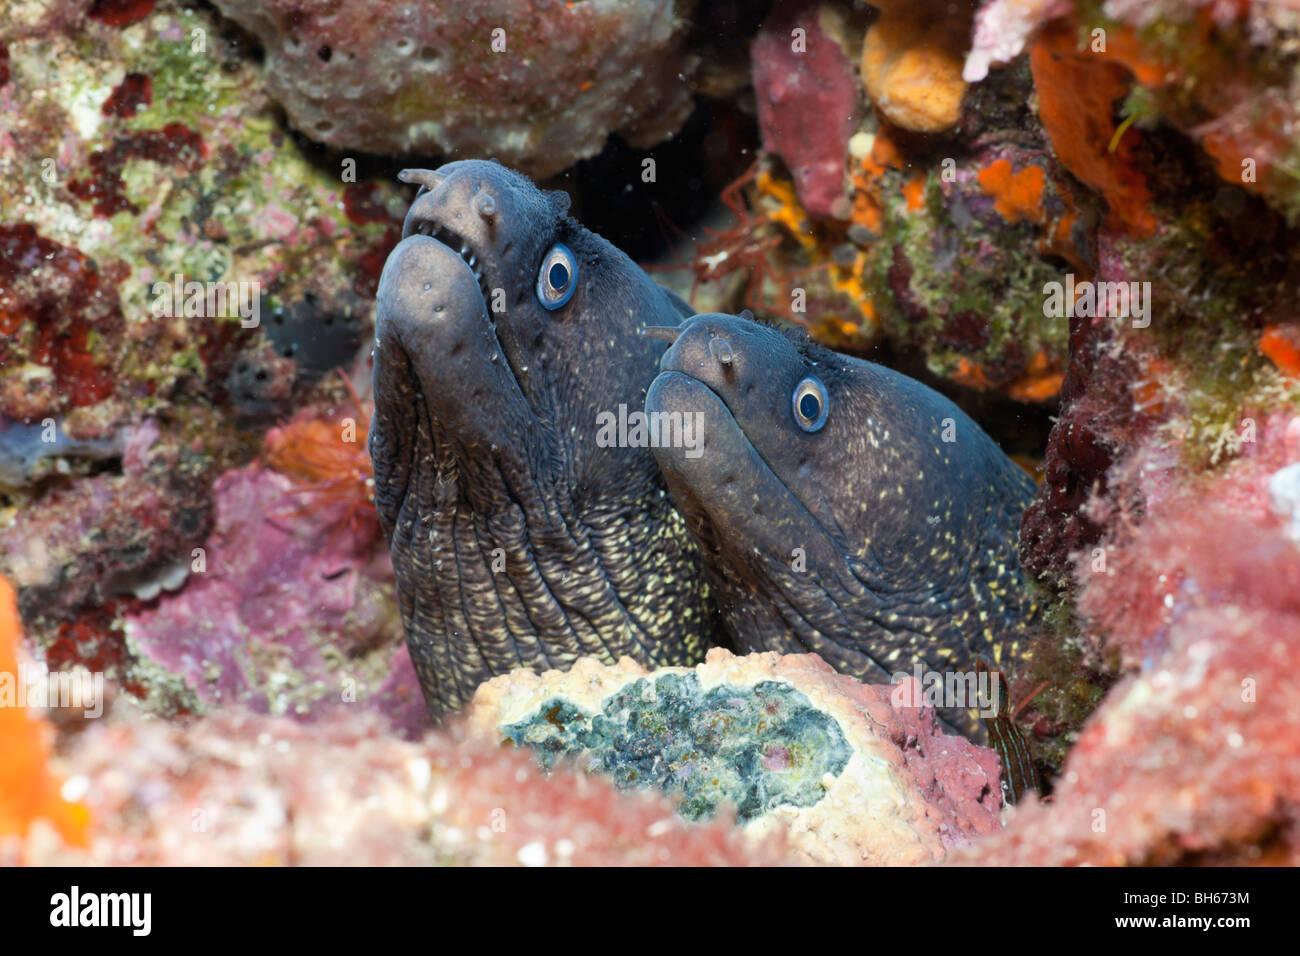 Couple of Mediterranean Moray, Muraena helena, Tamariu, Costa Brava, Mediterranean Sea, Spain Stock Photo